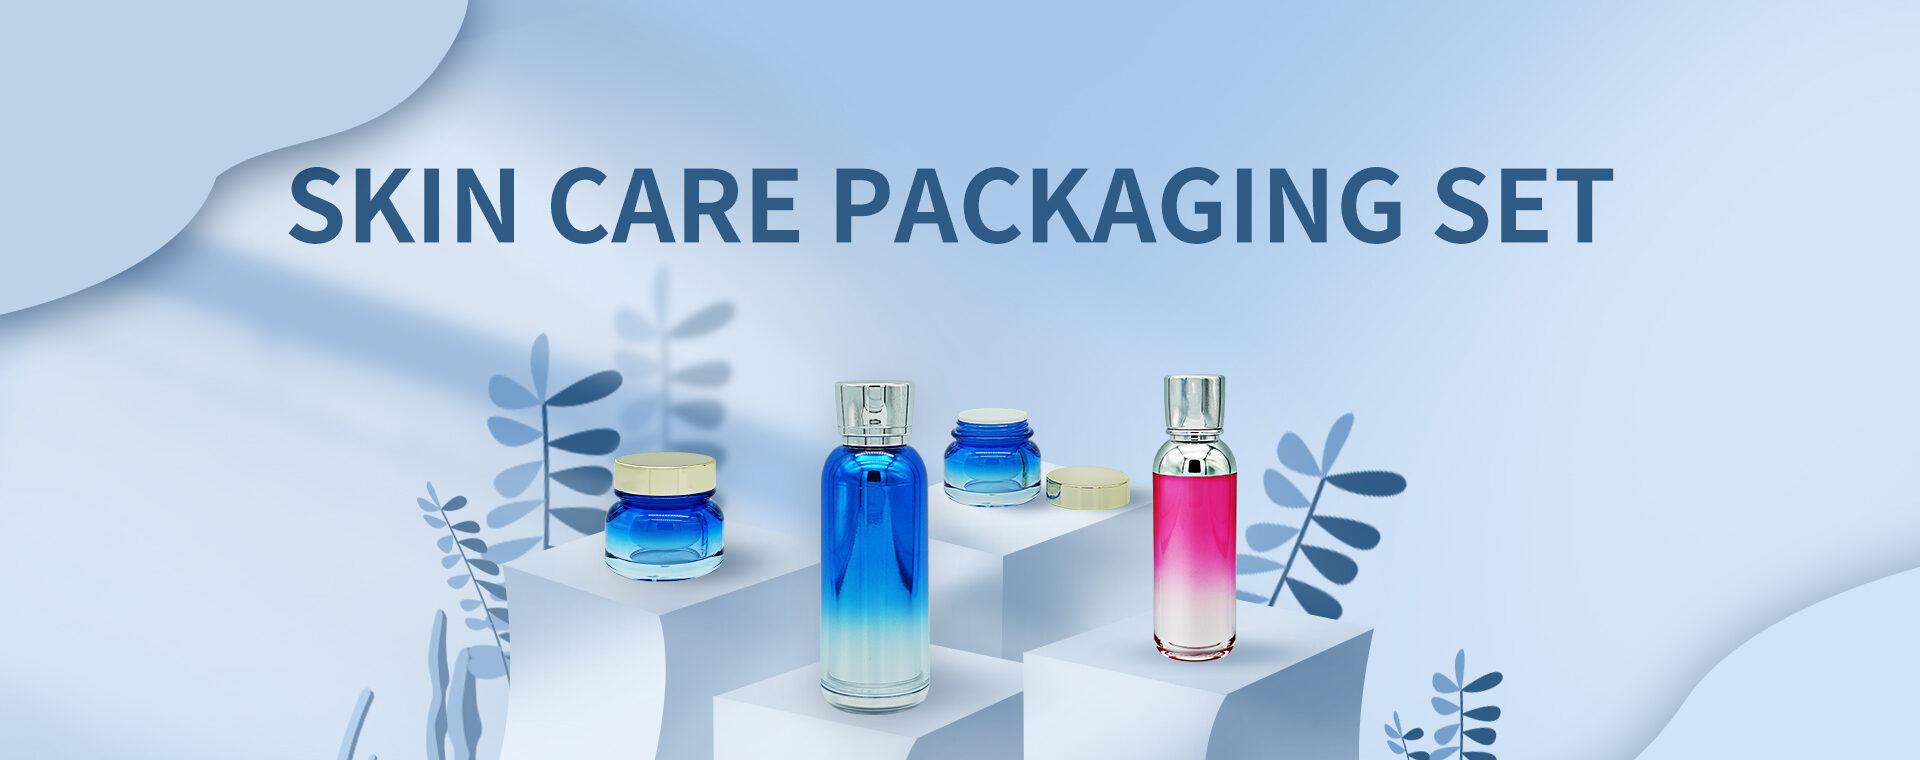 Skin Care Packaging Set